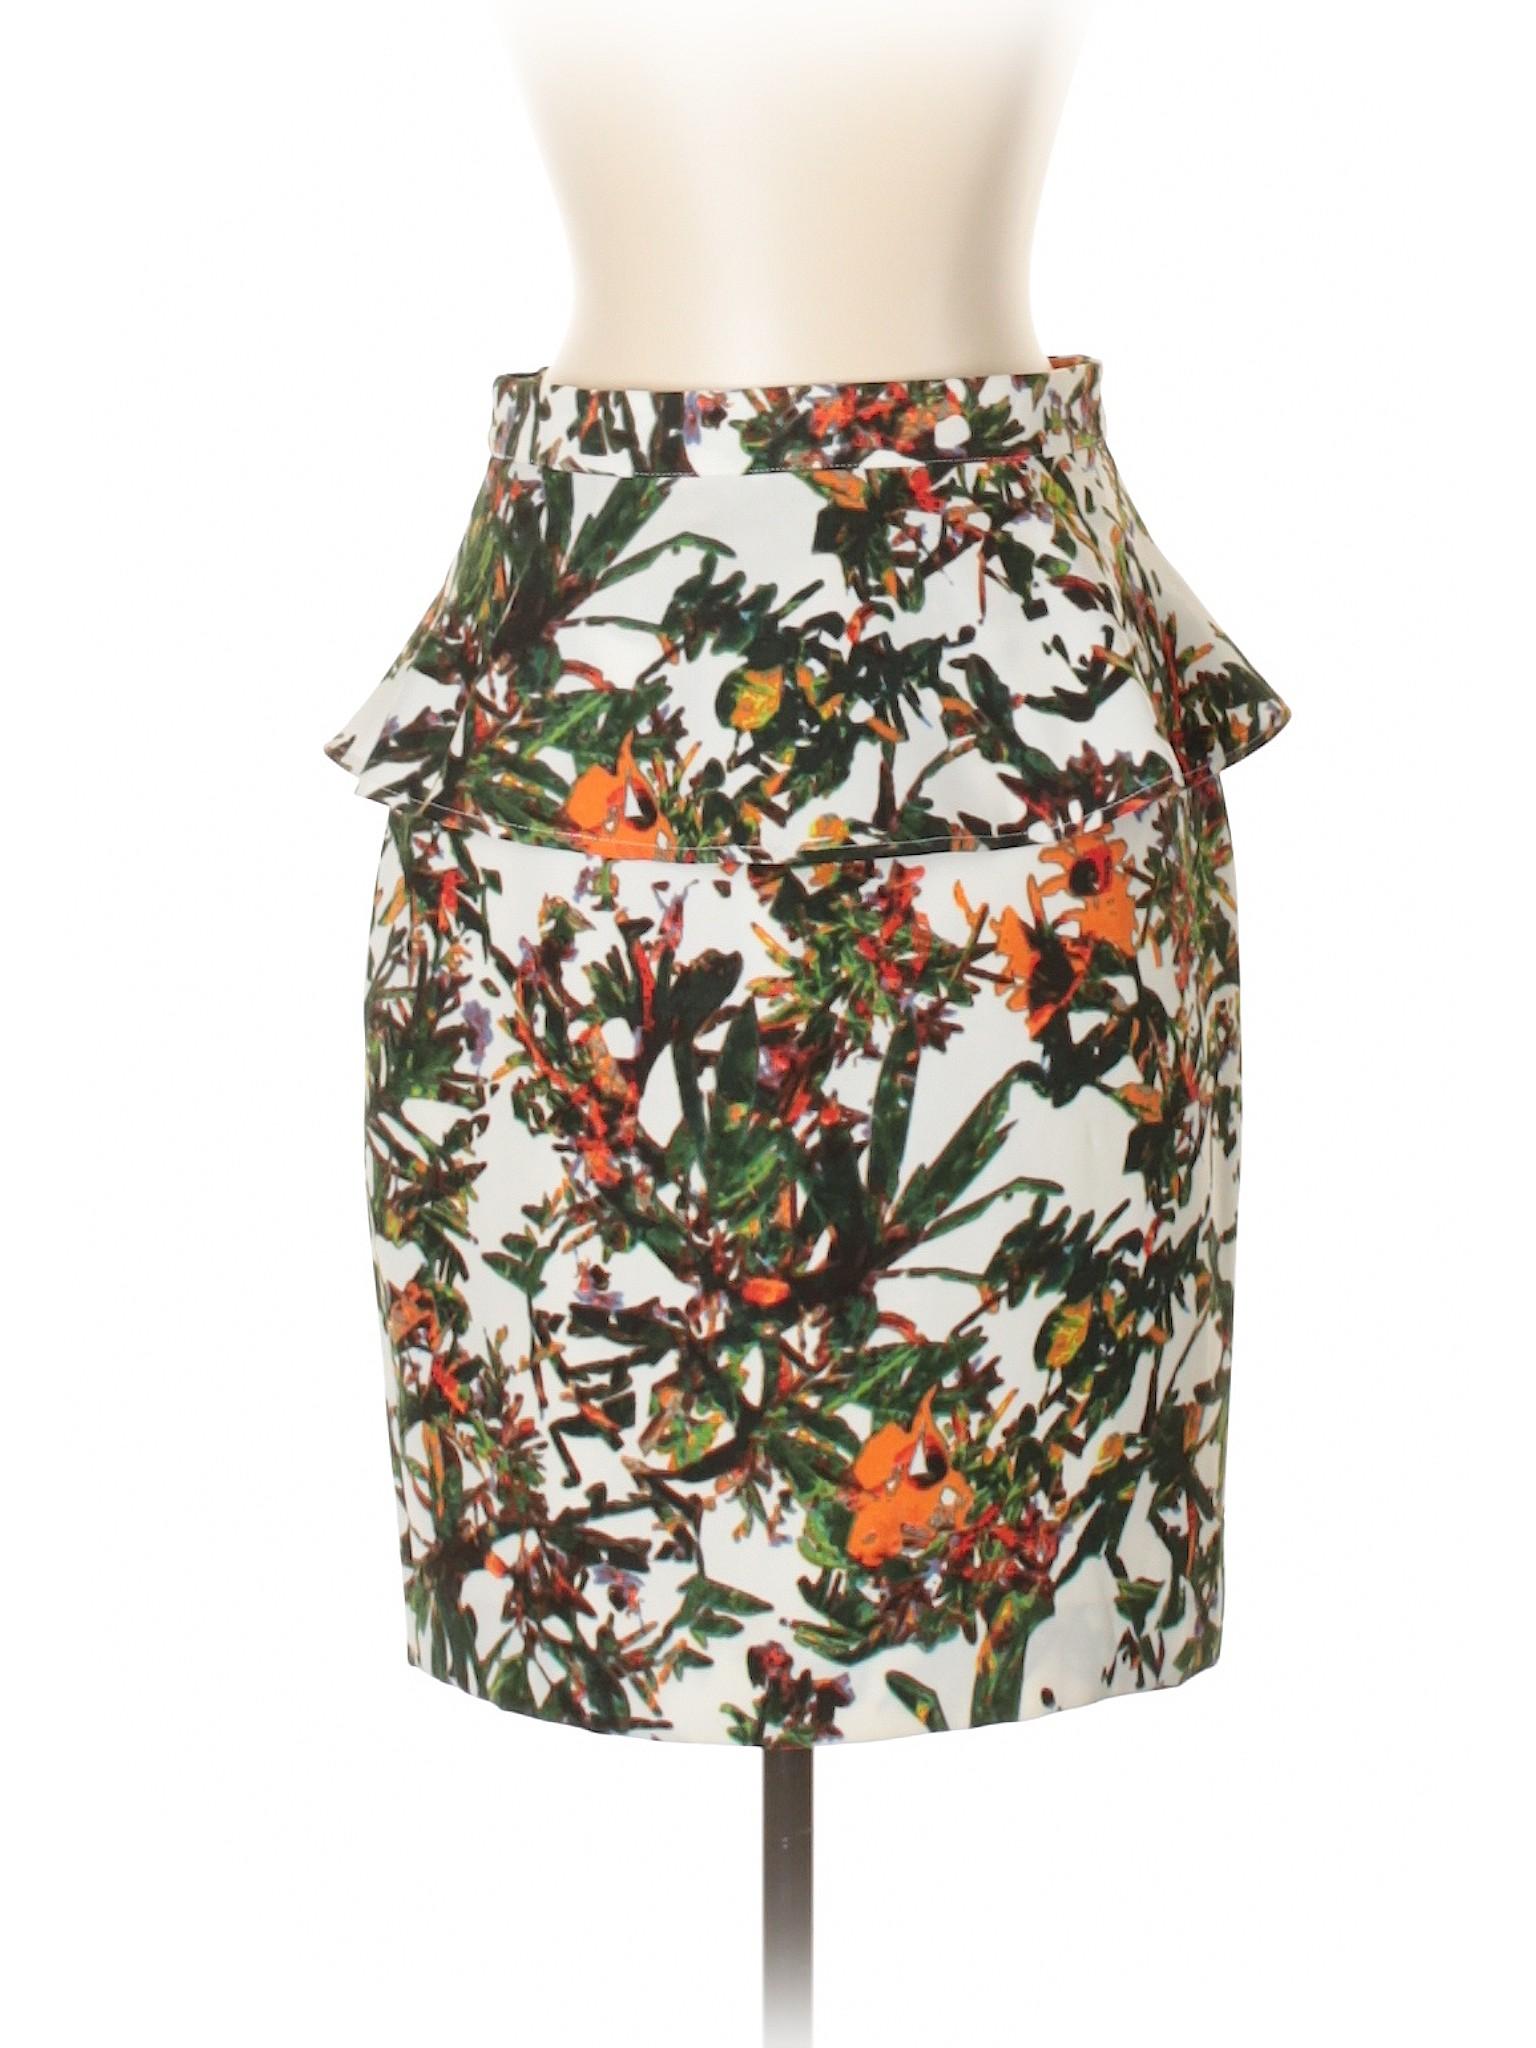 Casual Casual Skirt Skirt Skirt Boutique Skirt Casual Boutique Boutique Boutique Boutique Boutique Skirt Casual Casual wwvSEApq